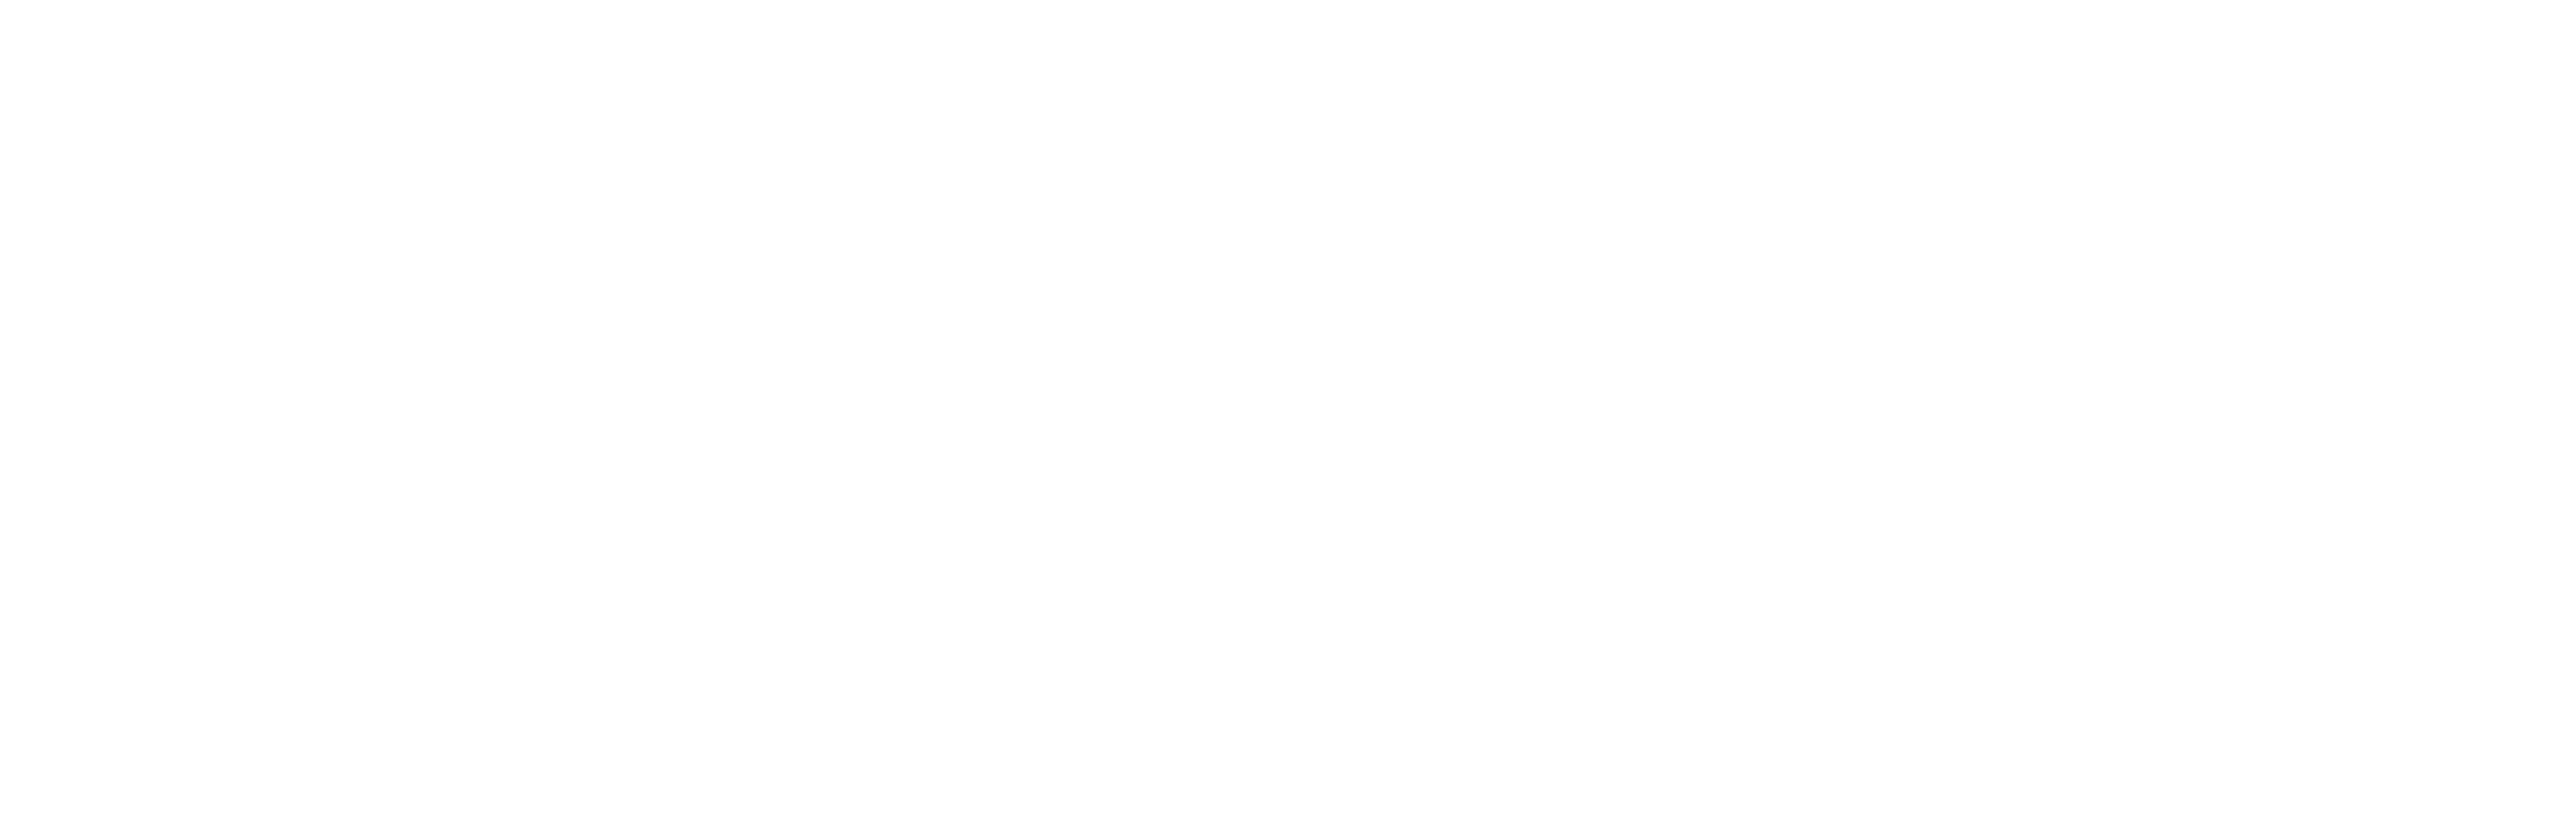 Earned Run Real Estate